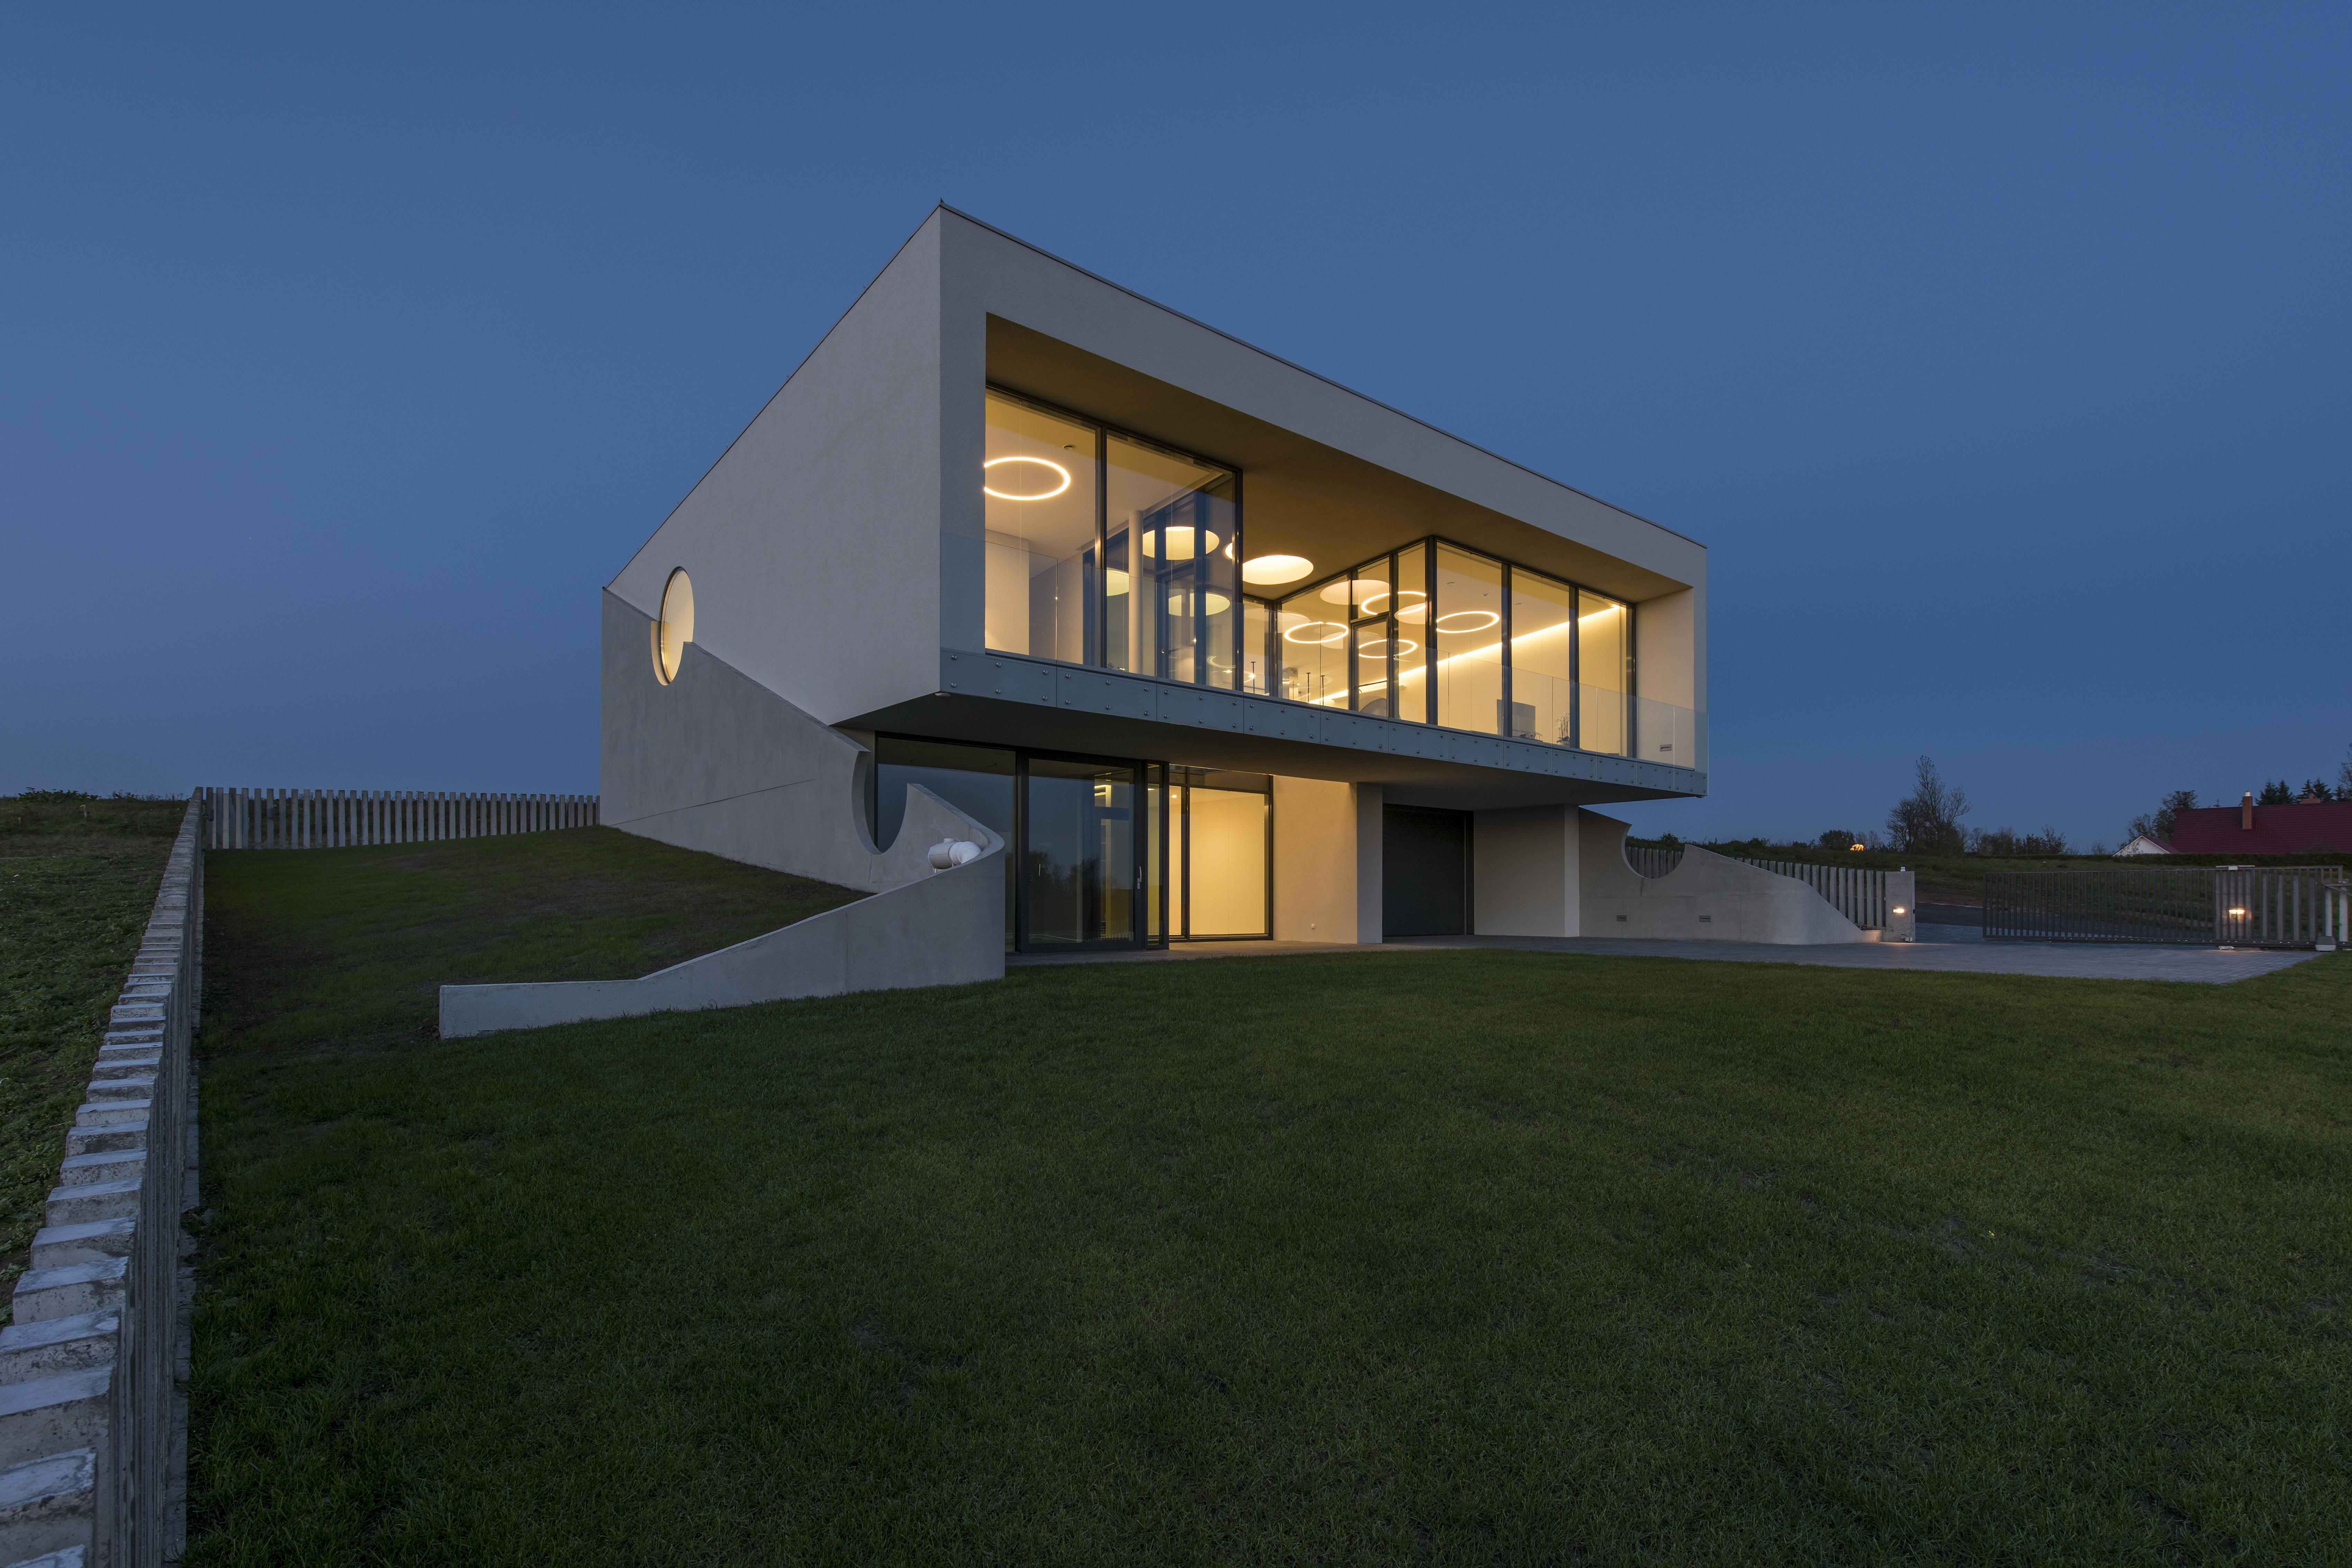 midos windows house